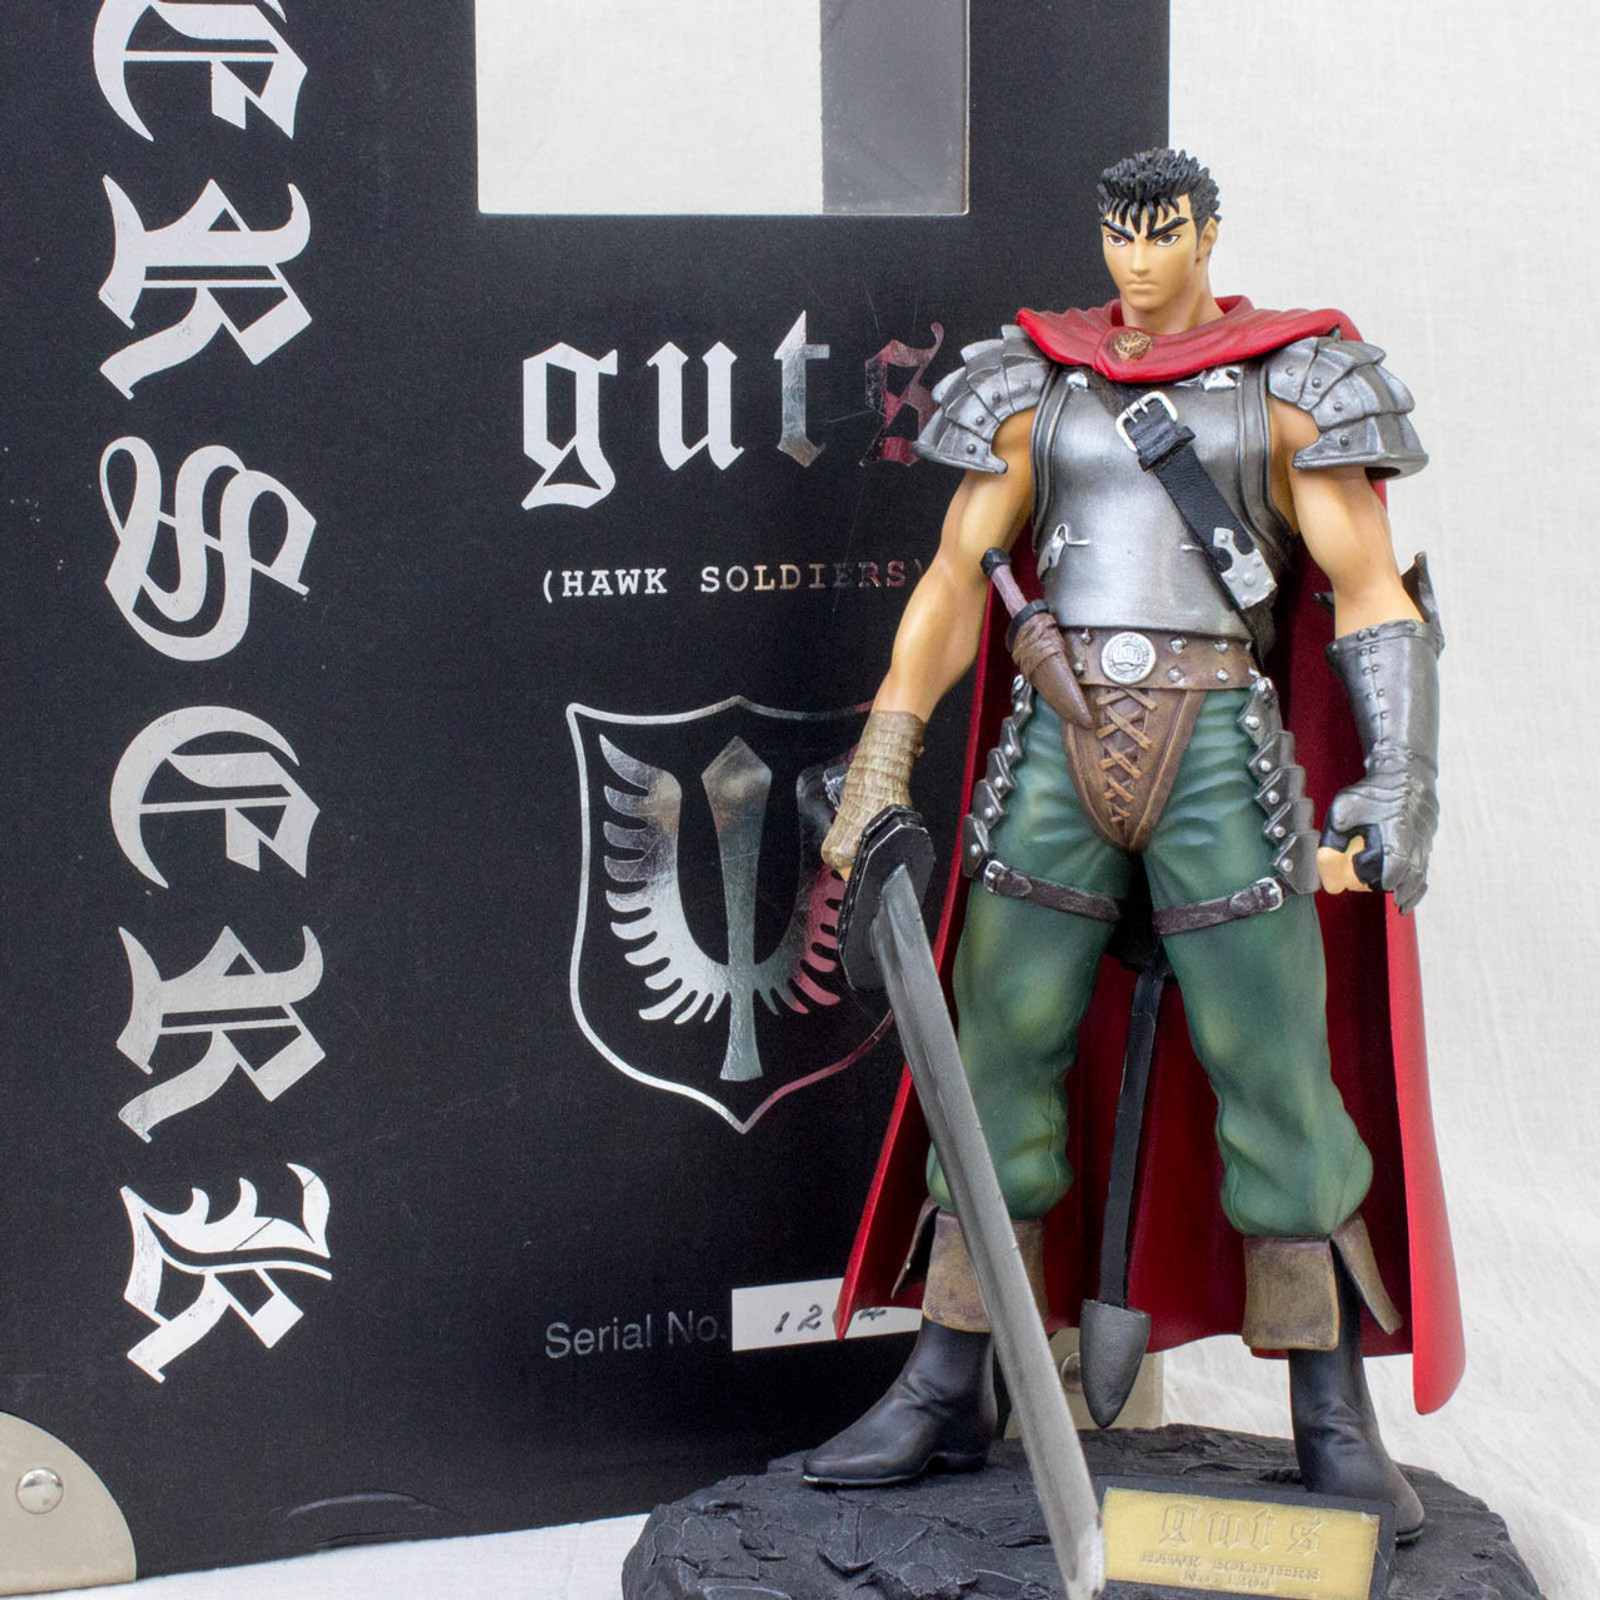 {Missing Parts} Berserk Guts Hawk Soldier Figure Limited Art of War JAPAN ANIME